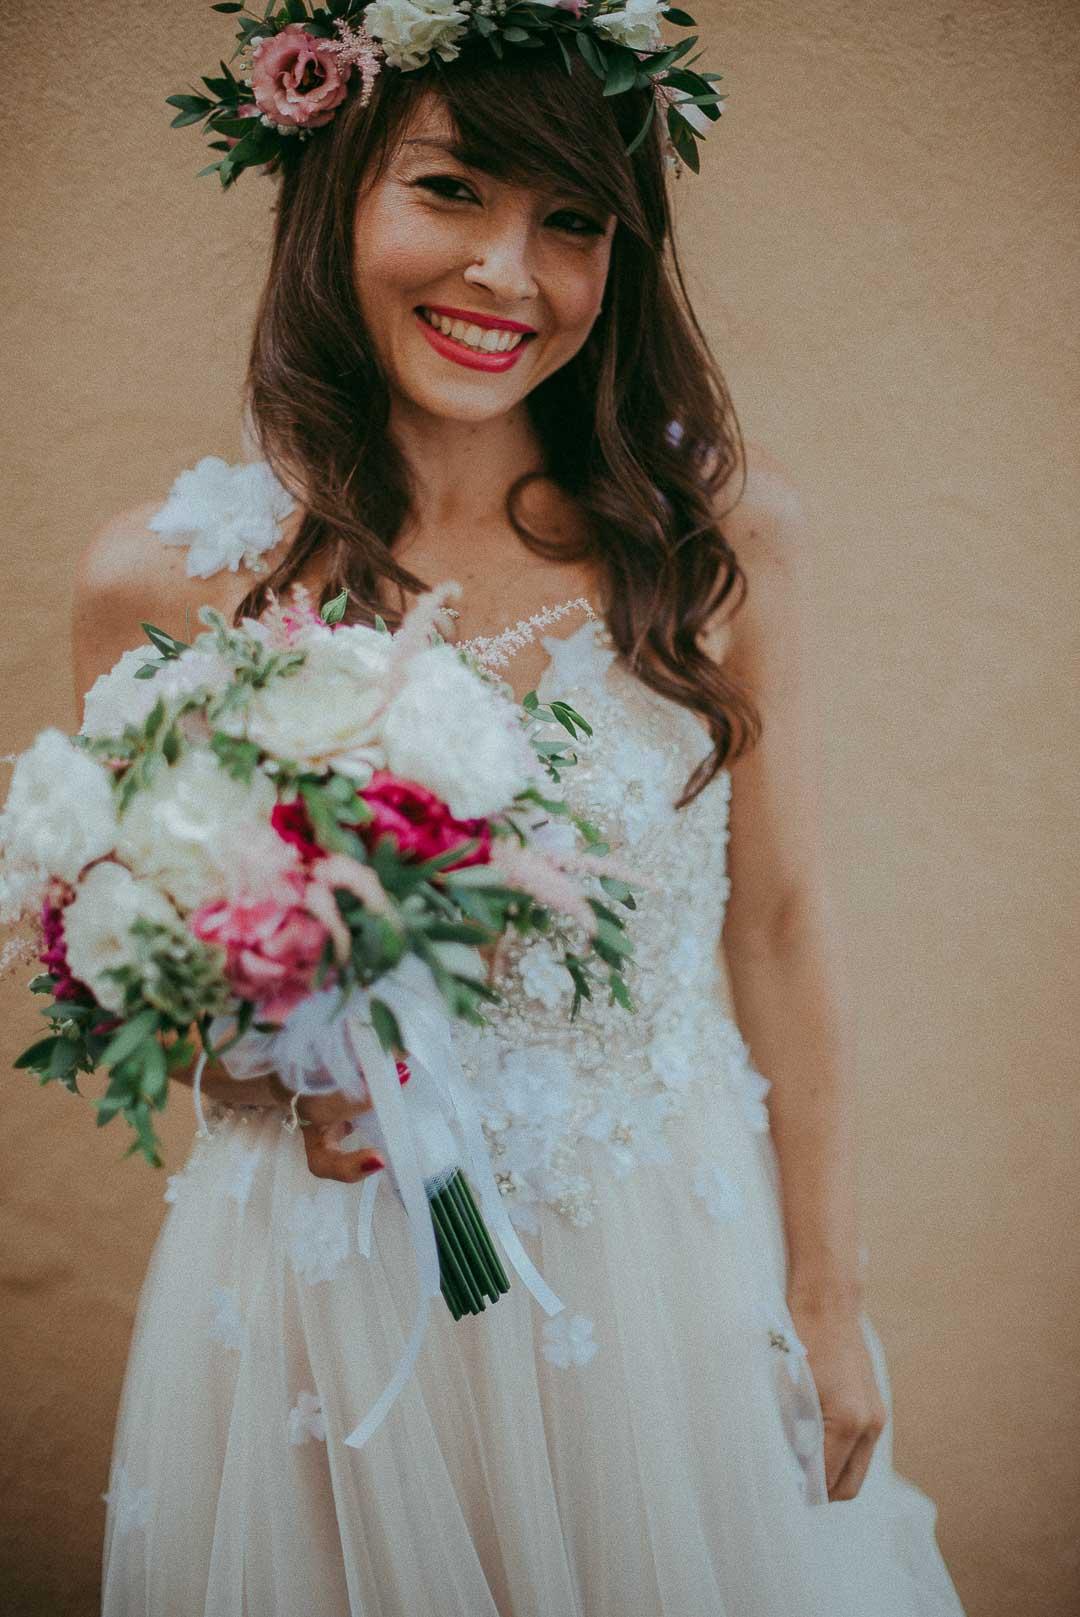 wedding-photographer-destination-fineart-bespoke-reportage-amalficoast-torrelacerniola-vivianeizzo-spazio46-49